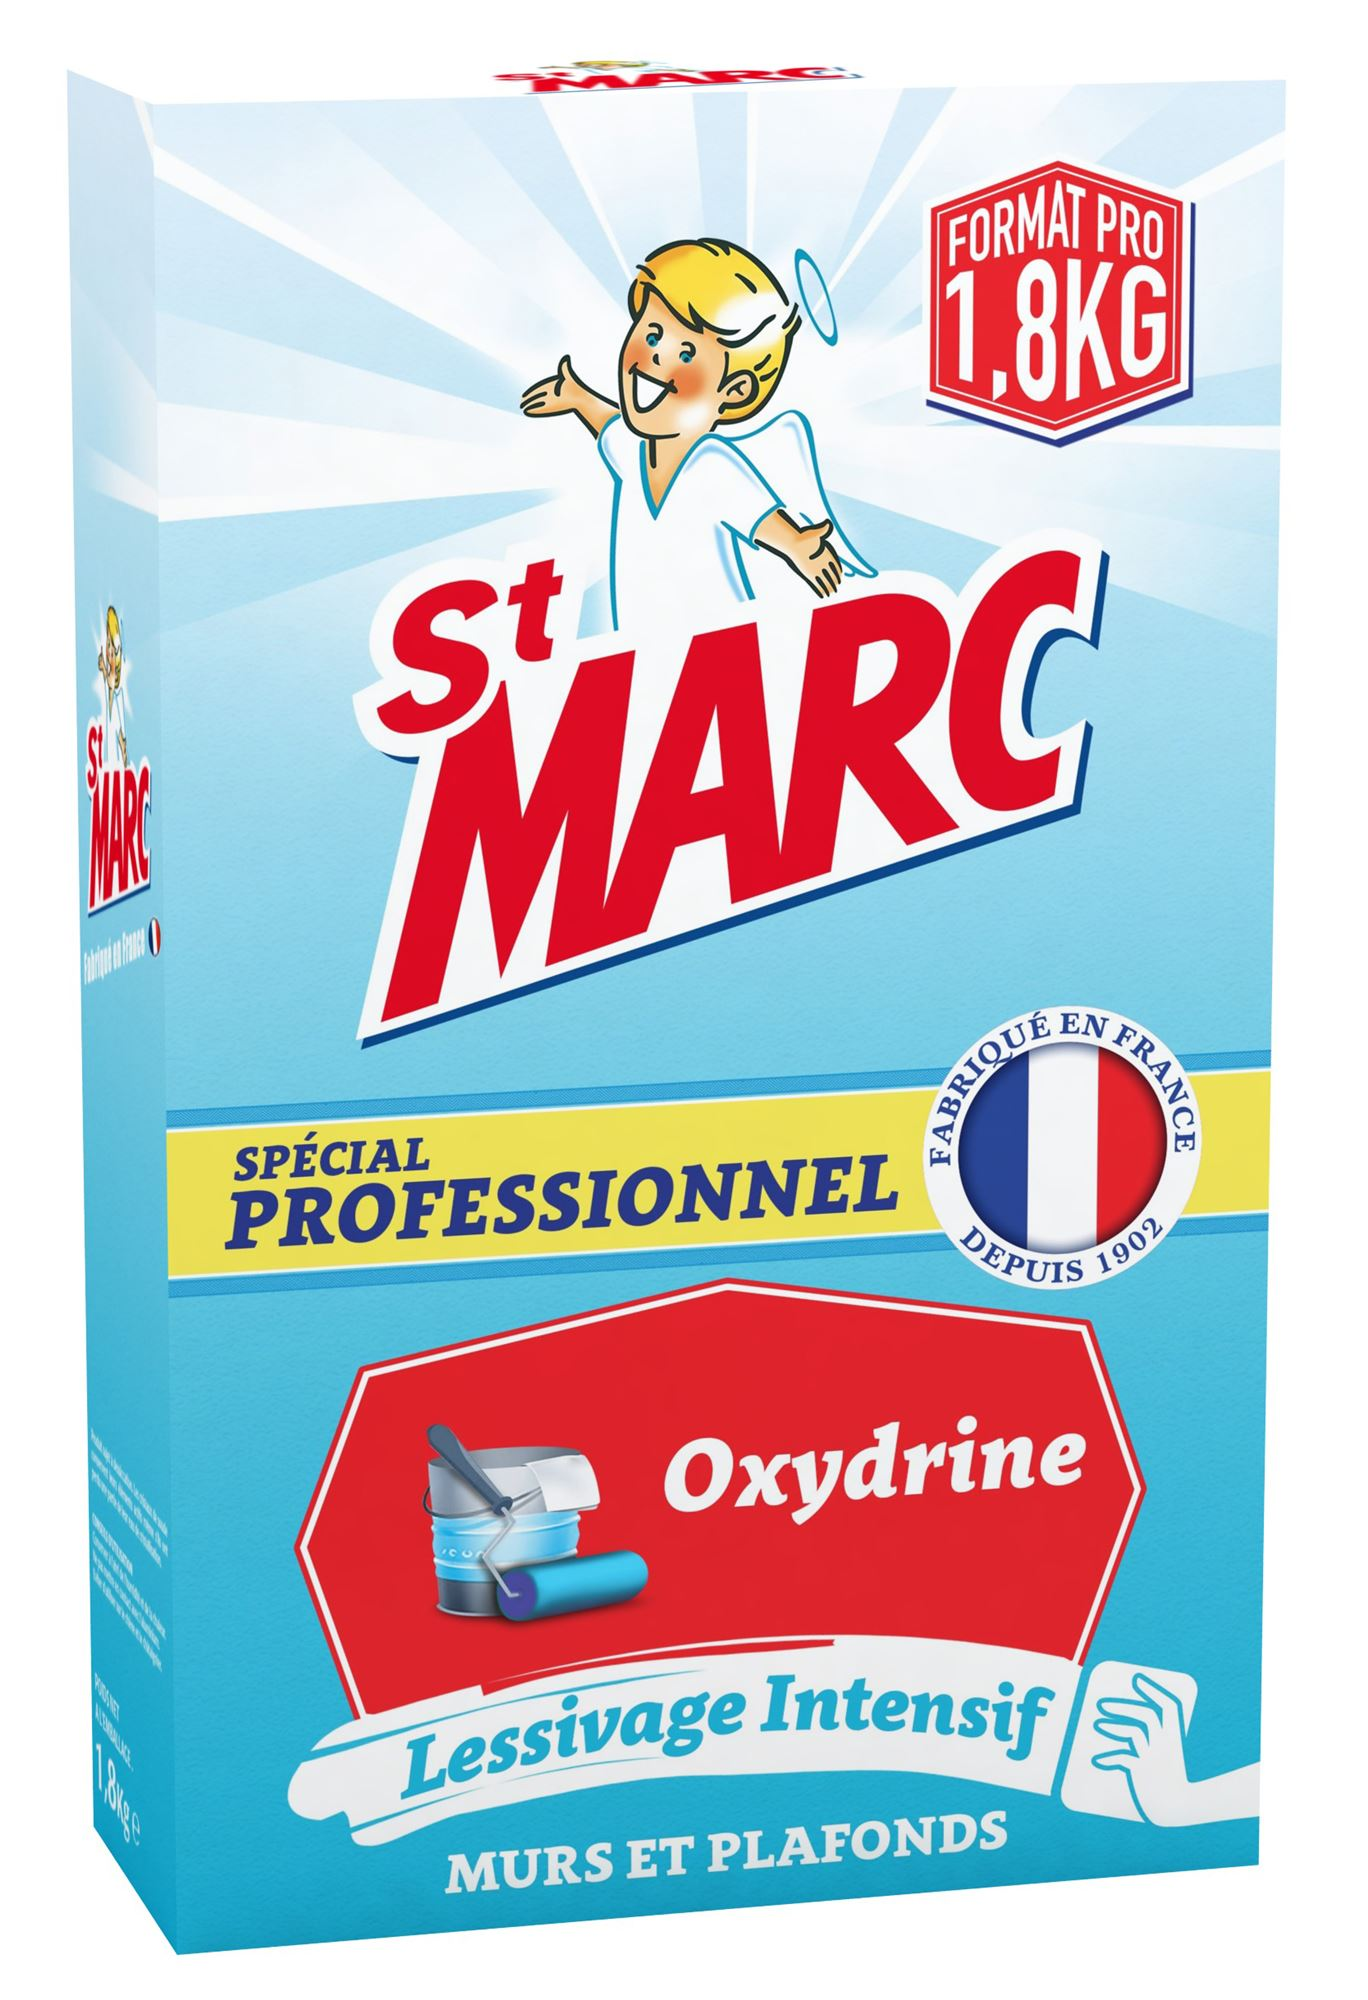 Laundry Saint Marc Oxydrine